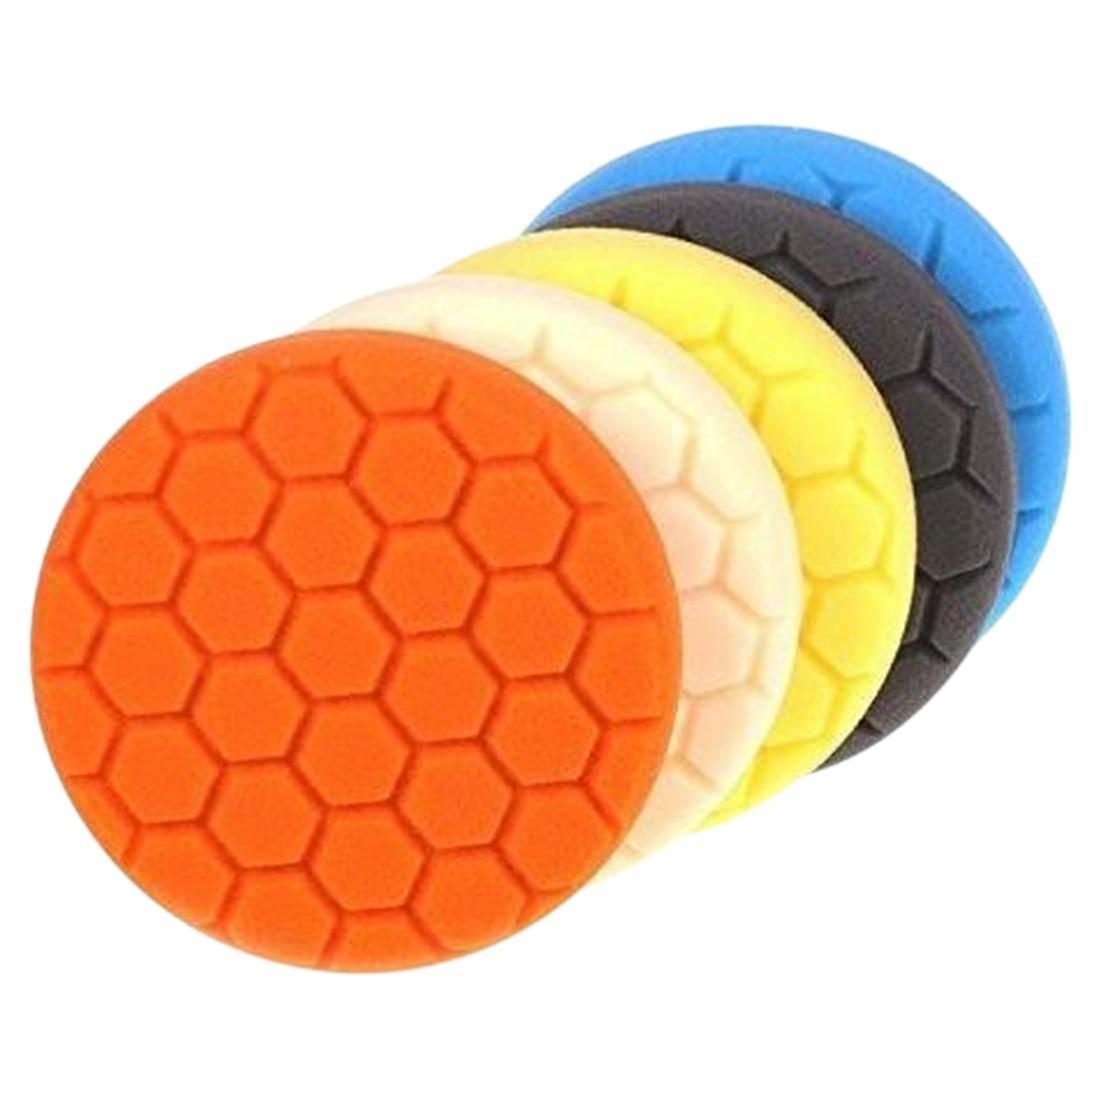 3pcs 3/4/5/6/7 Inch Buffing Sponge Polishing Pad Kit Set For Car Polisher Buffer For  Car Beauty Polishing Waxing Glaze